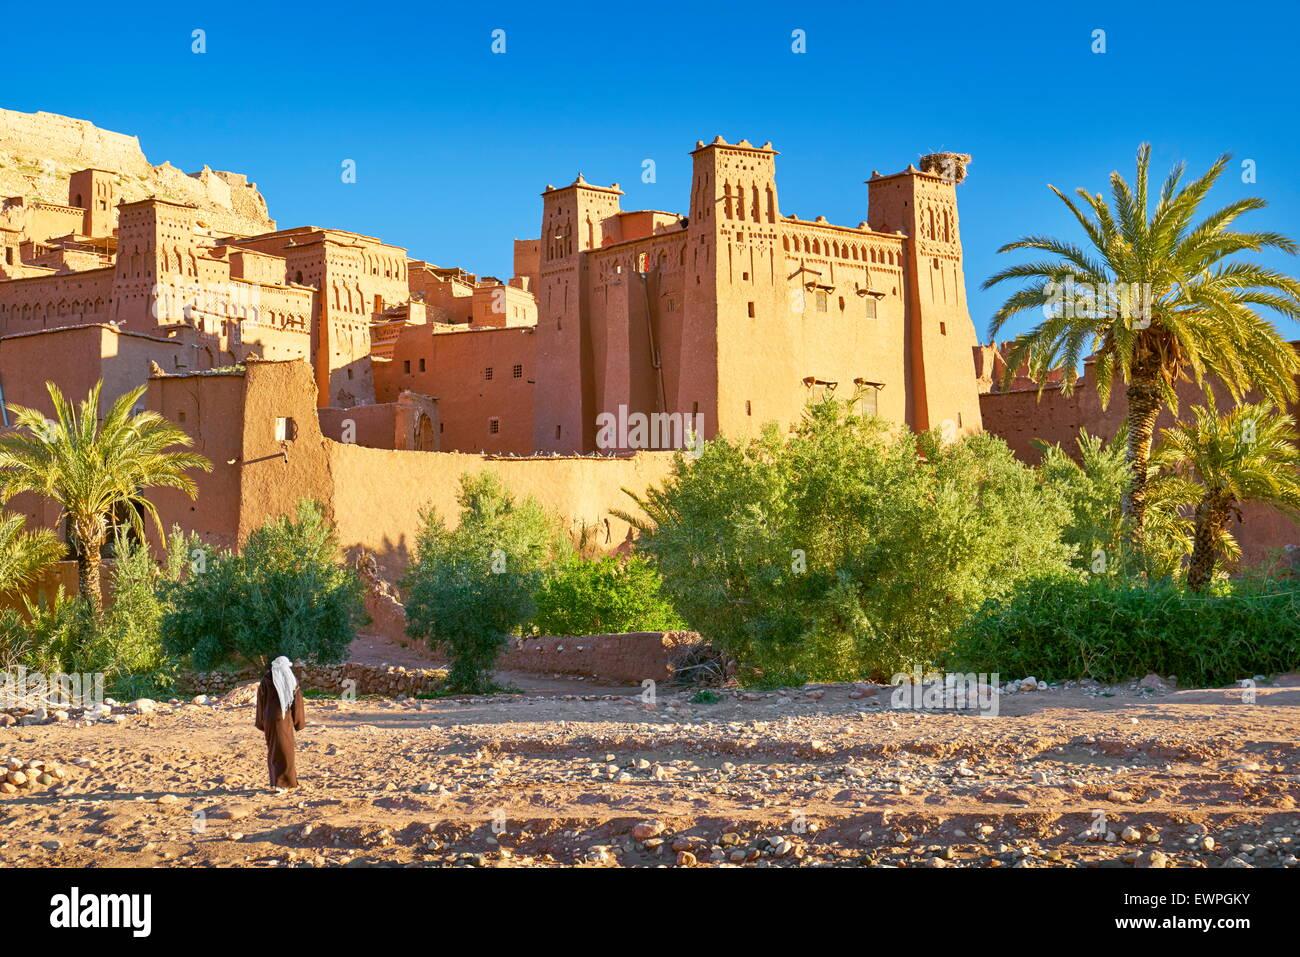 Ait Benhaddou fortaleza cerca de Ouarzazate, Marruecos Imagen De Stock